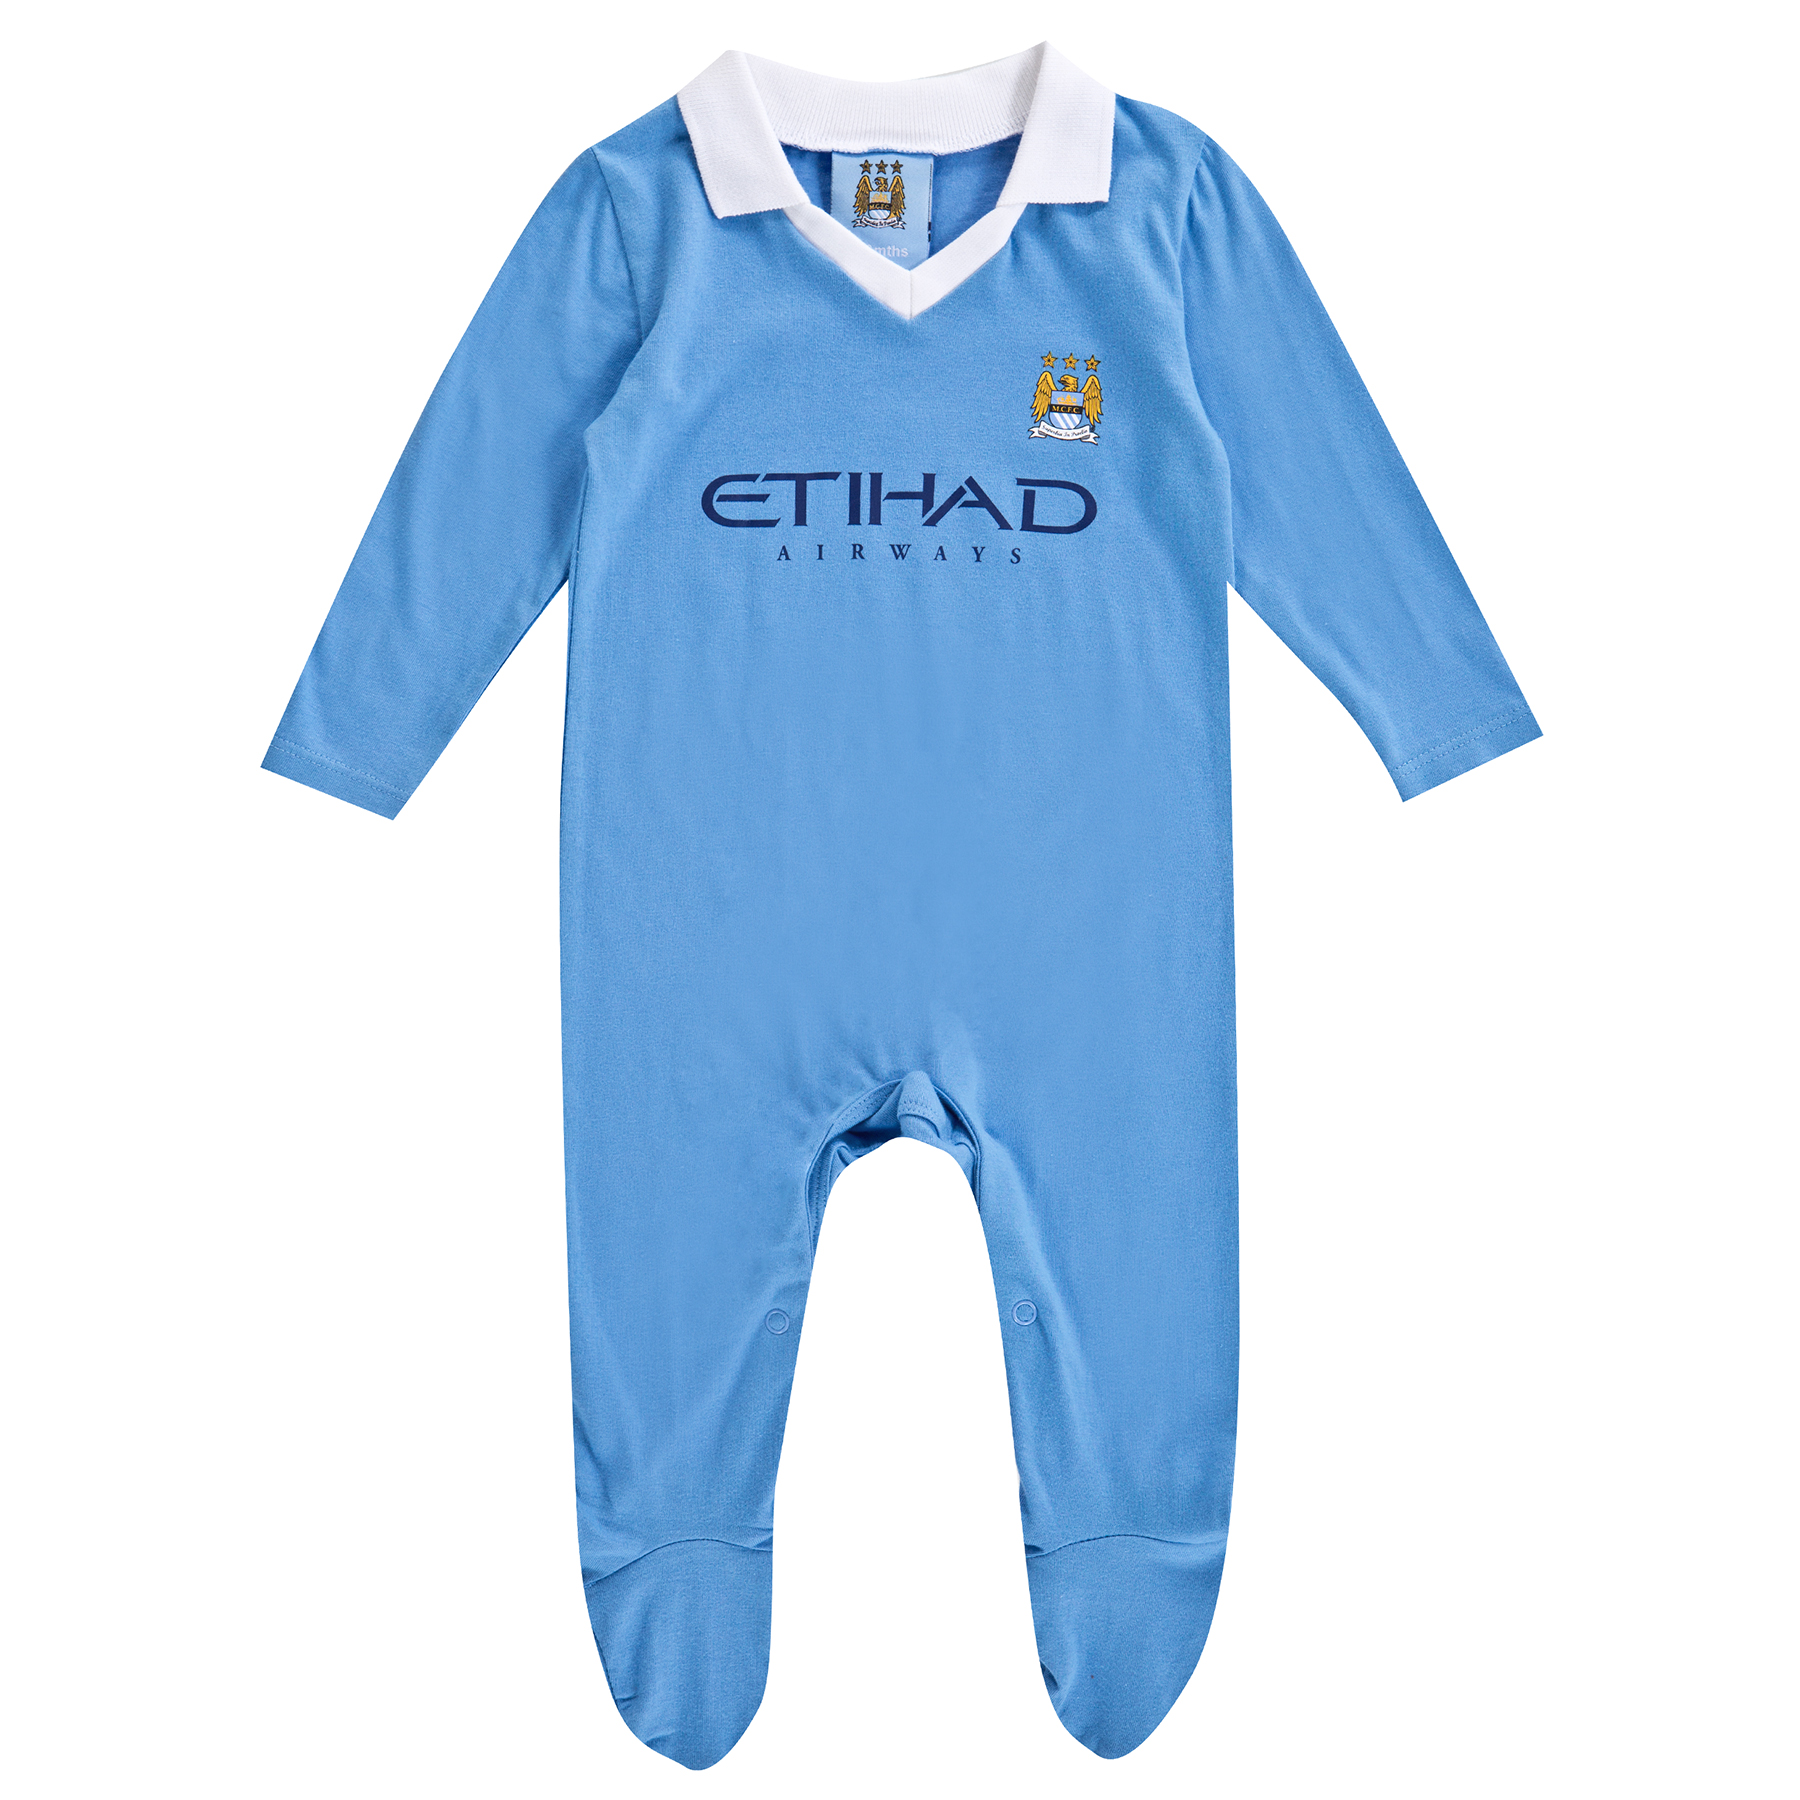 Manchester City 15/16 Kit Sleepsuit - Sky Blue - Baby